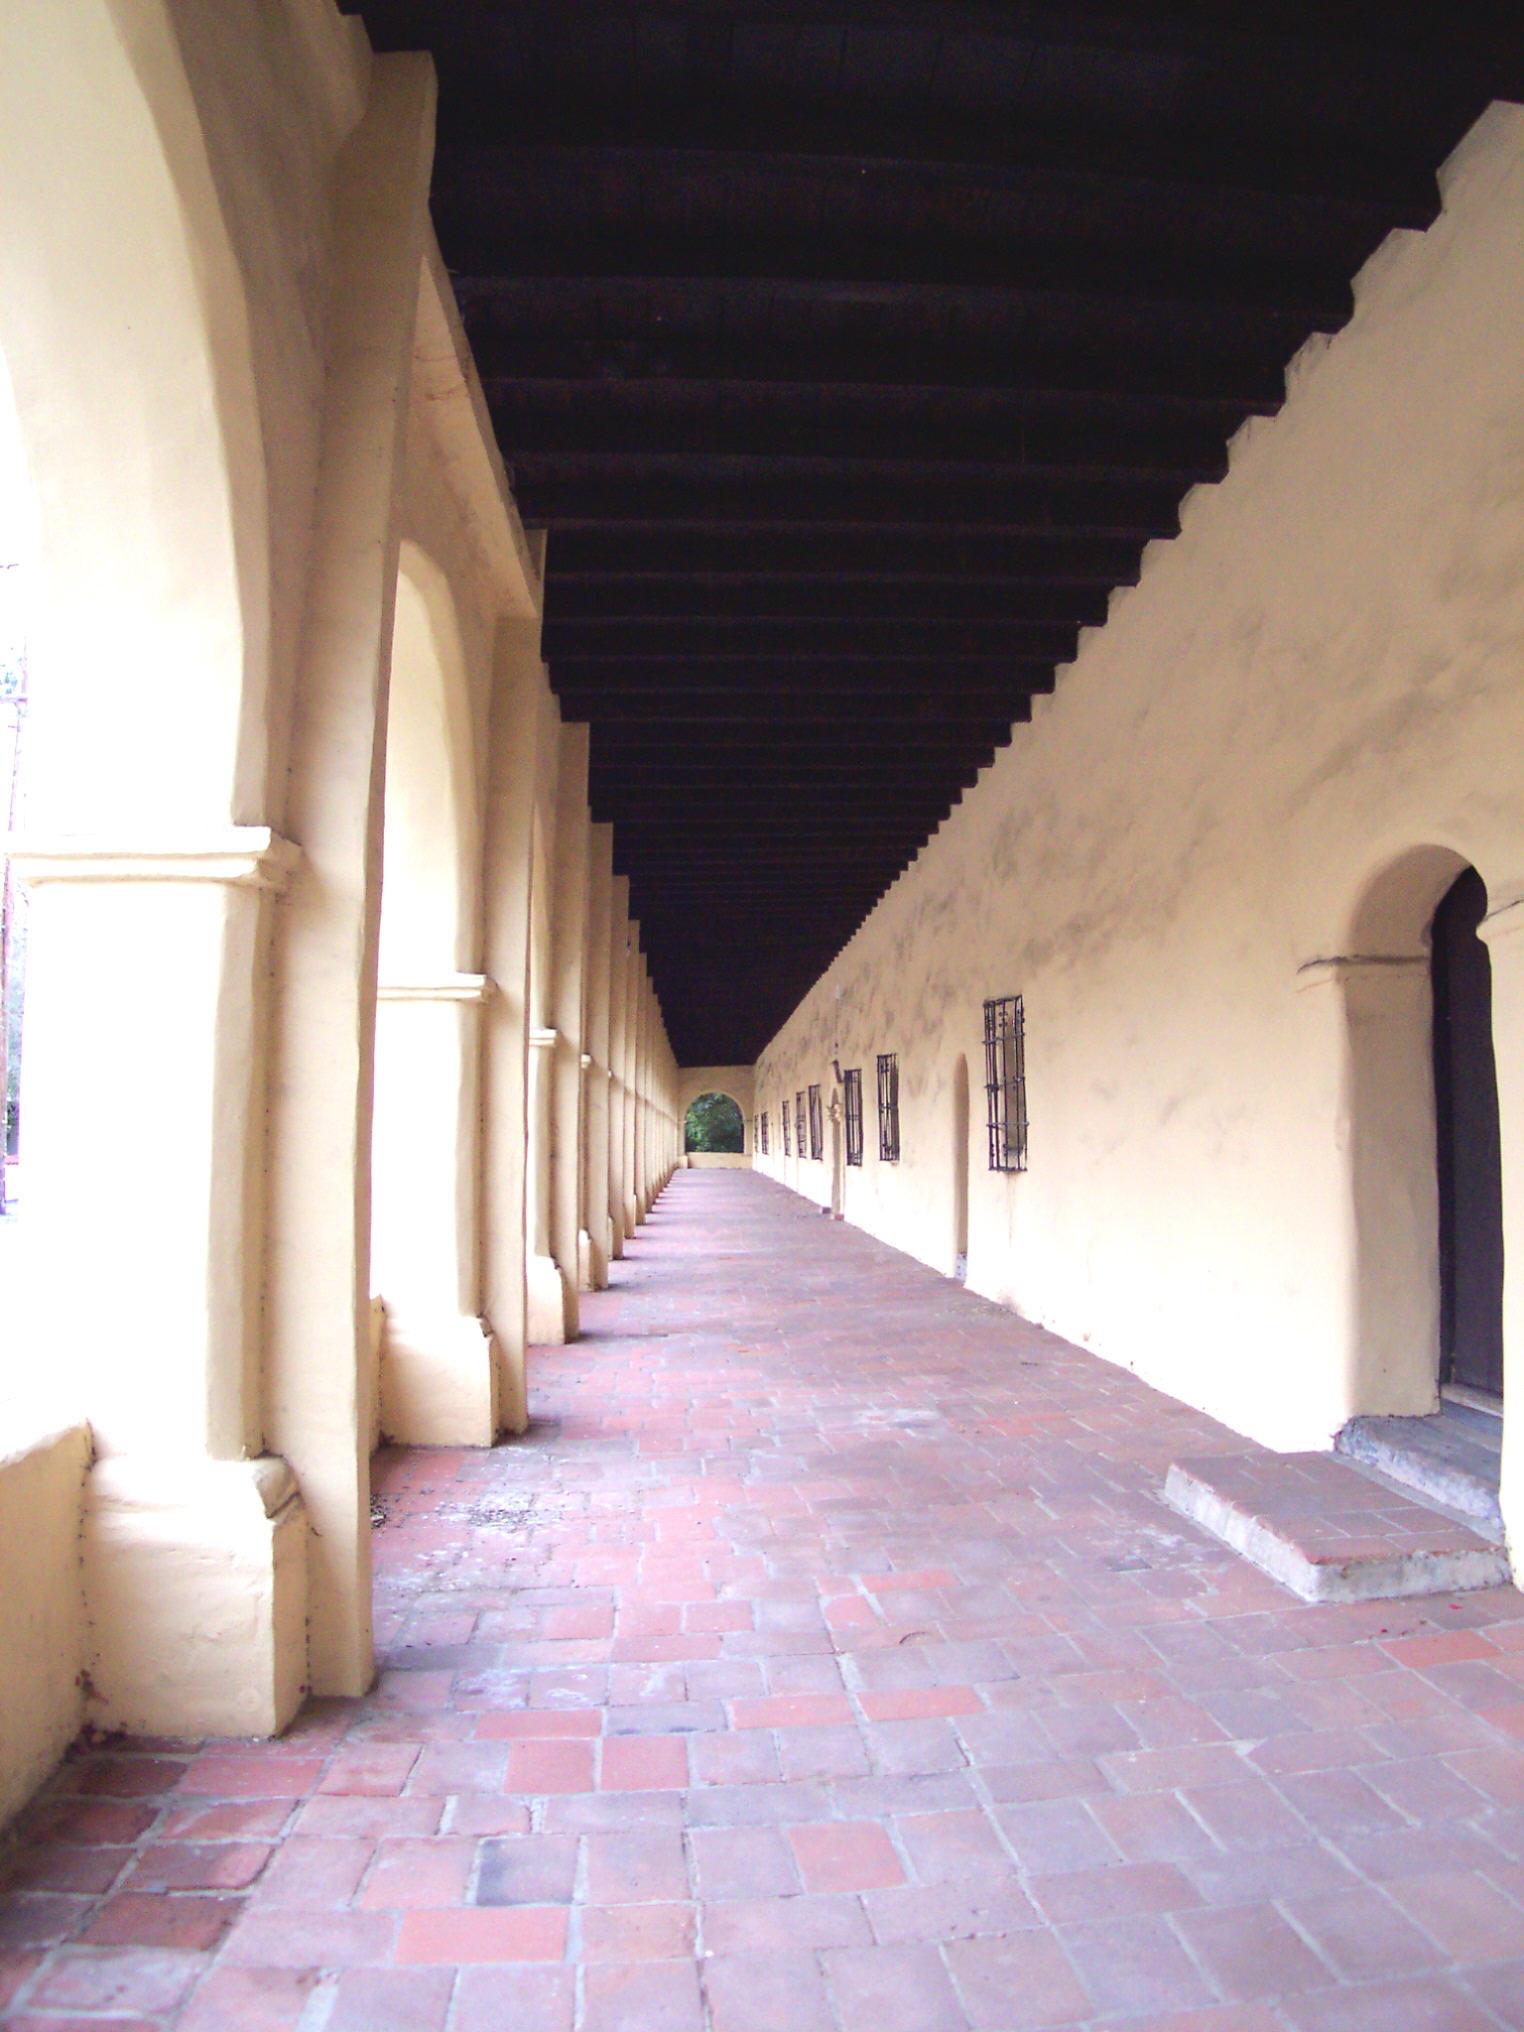 Dateiexterior Corridor At San Fernando Rey De Espanajpg Wikipedia